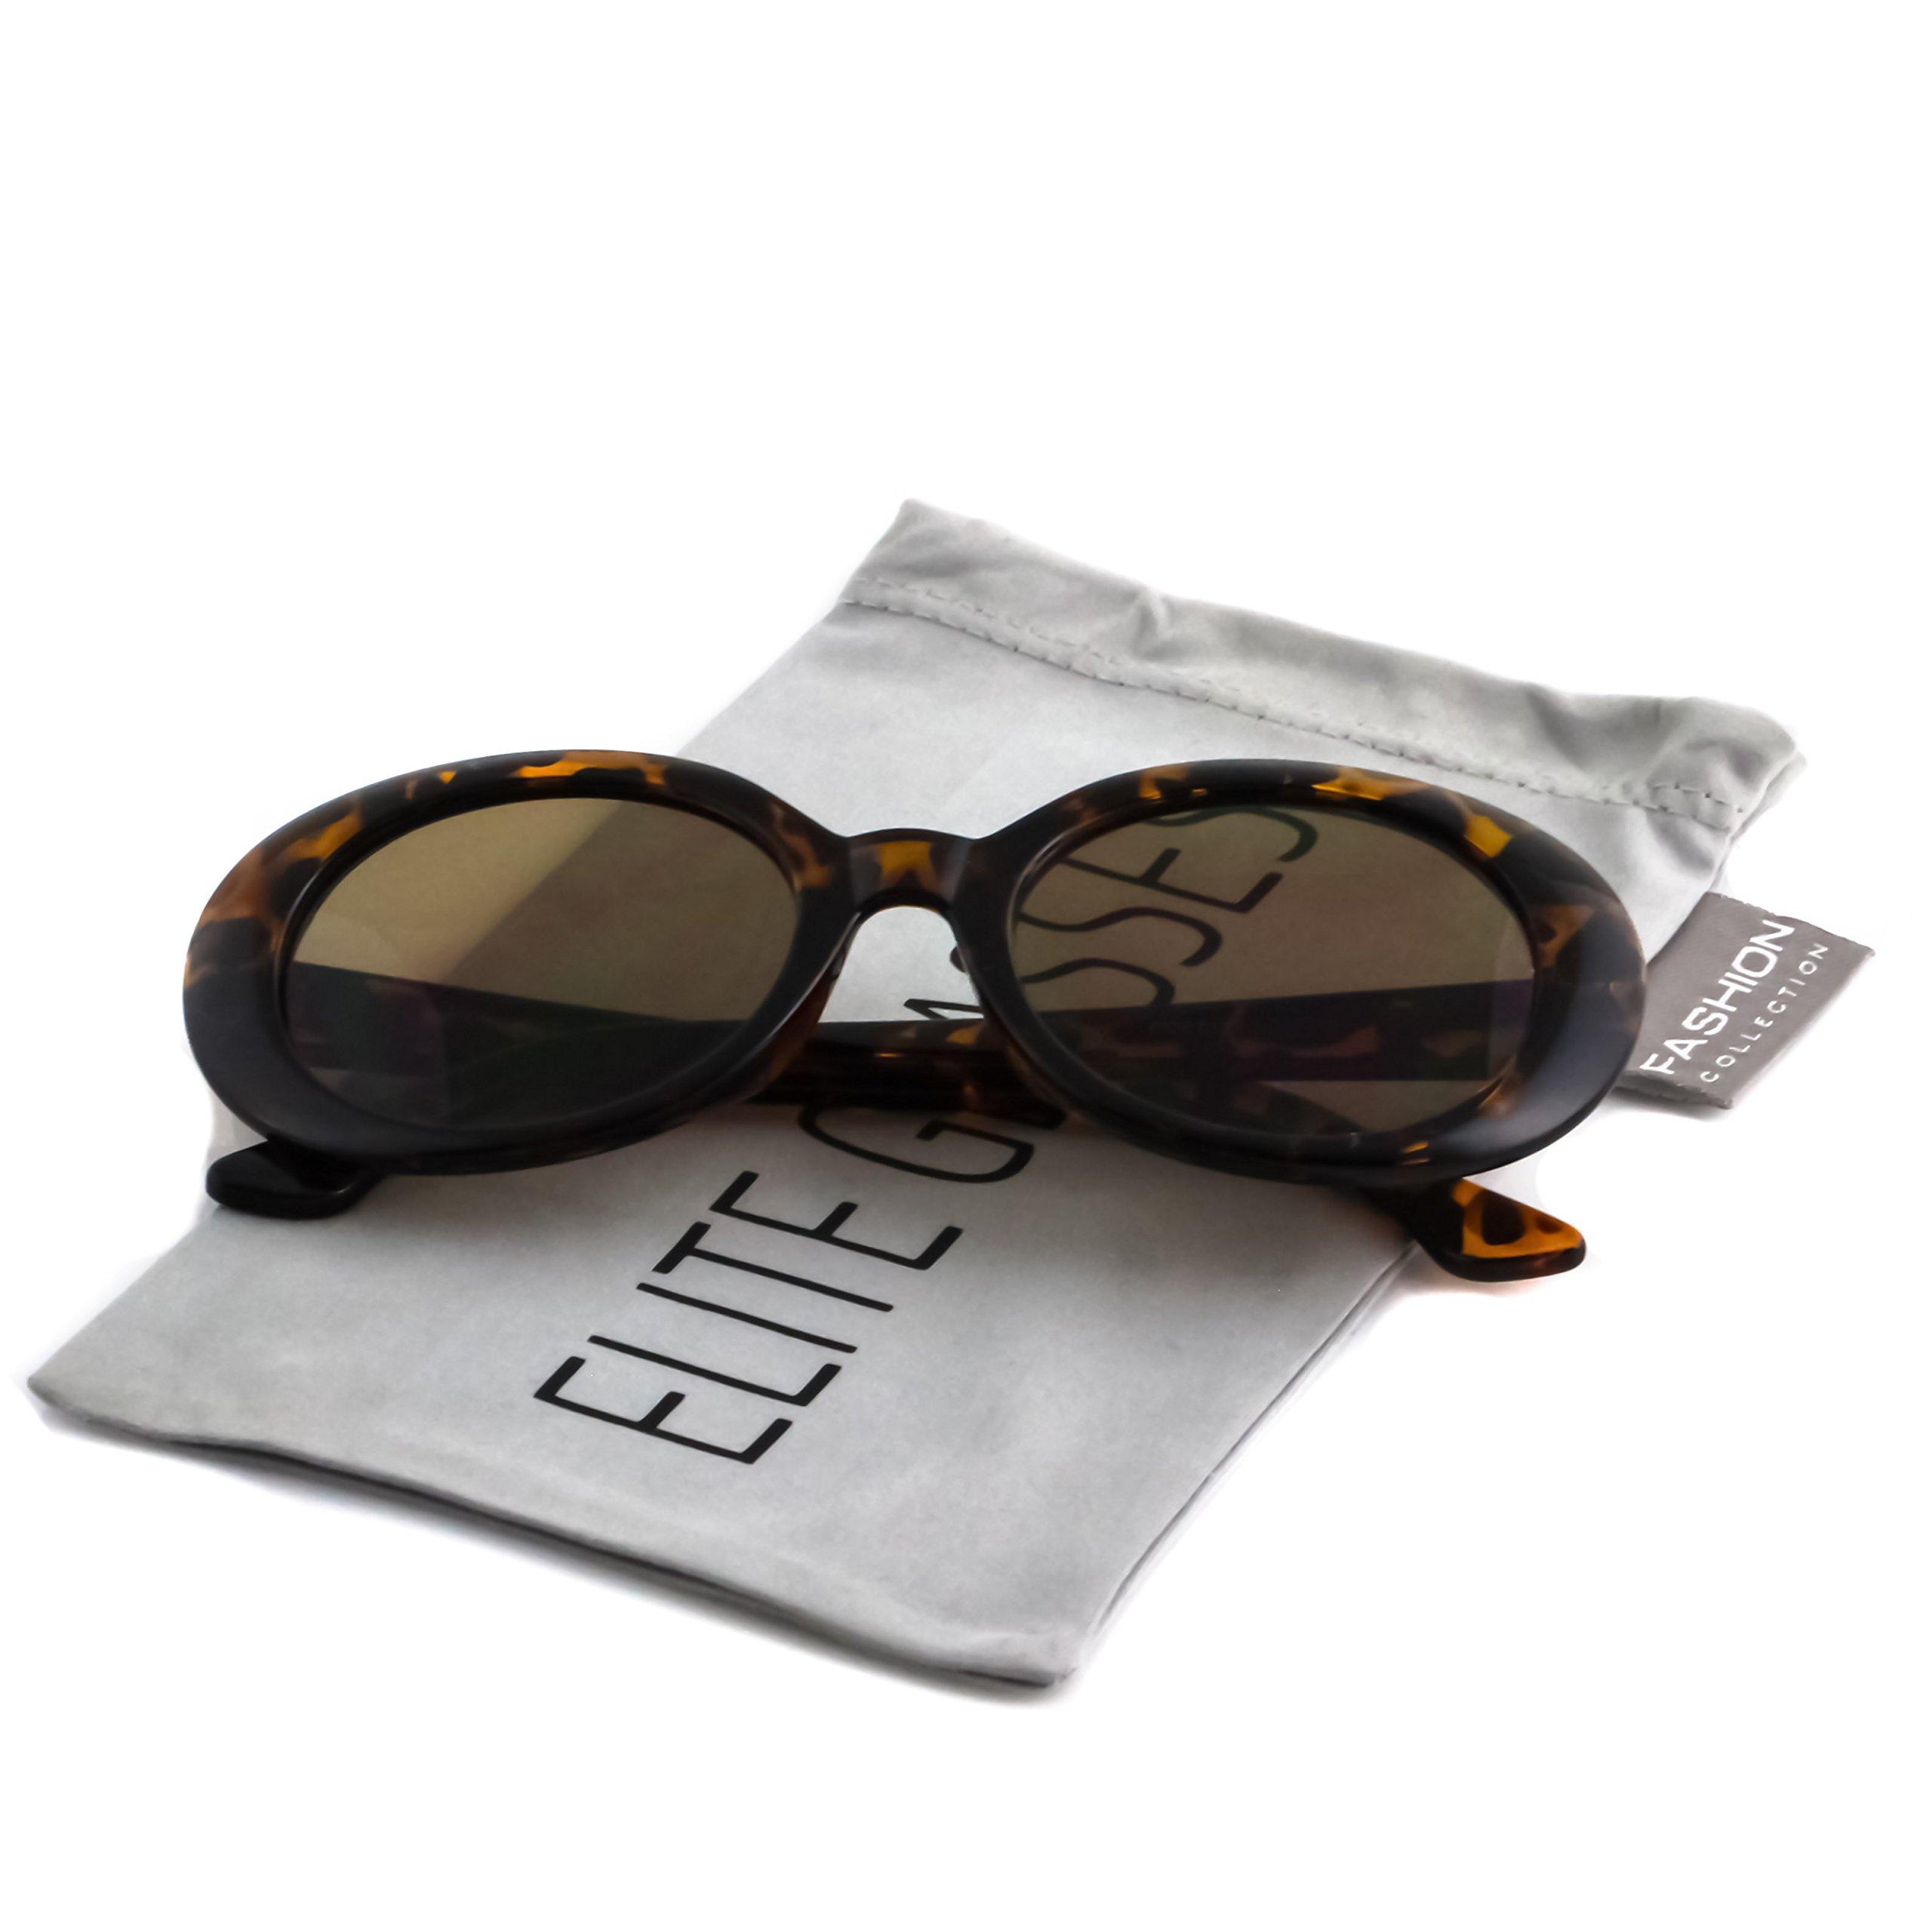 de66a649ce Galleon - Clout Goggles Oval Mod Retro Thick Frame Rapper Hypebeast Eyewear  Supreme Glasses Cool Sunglasses